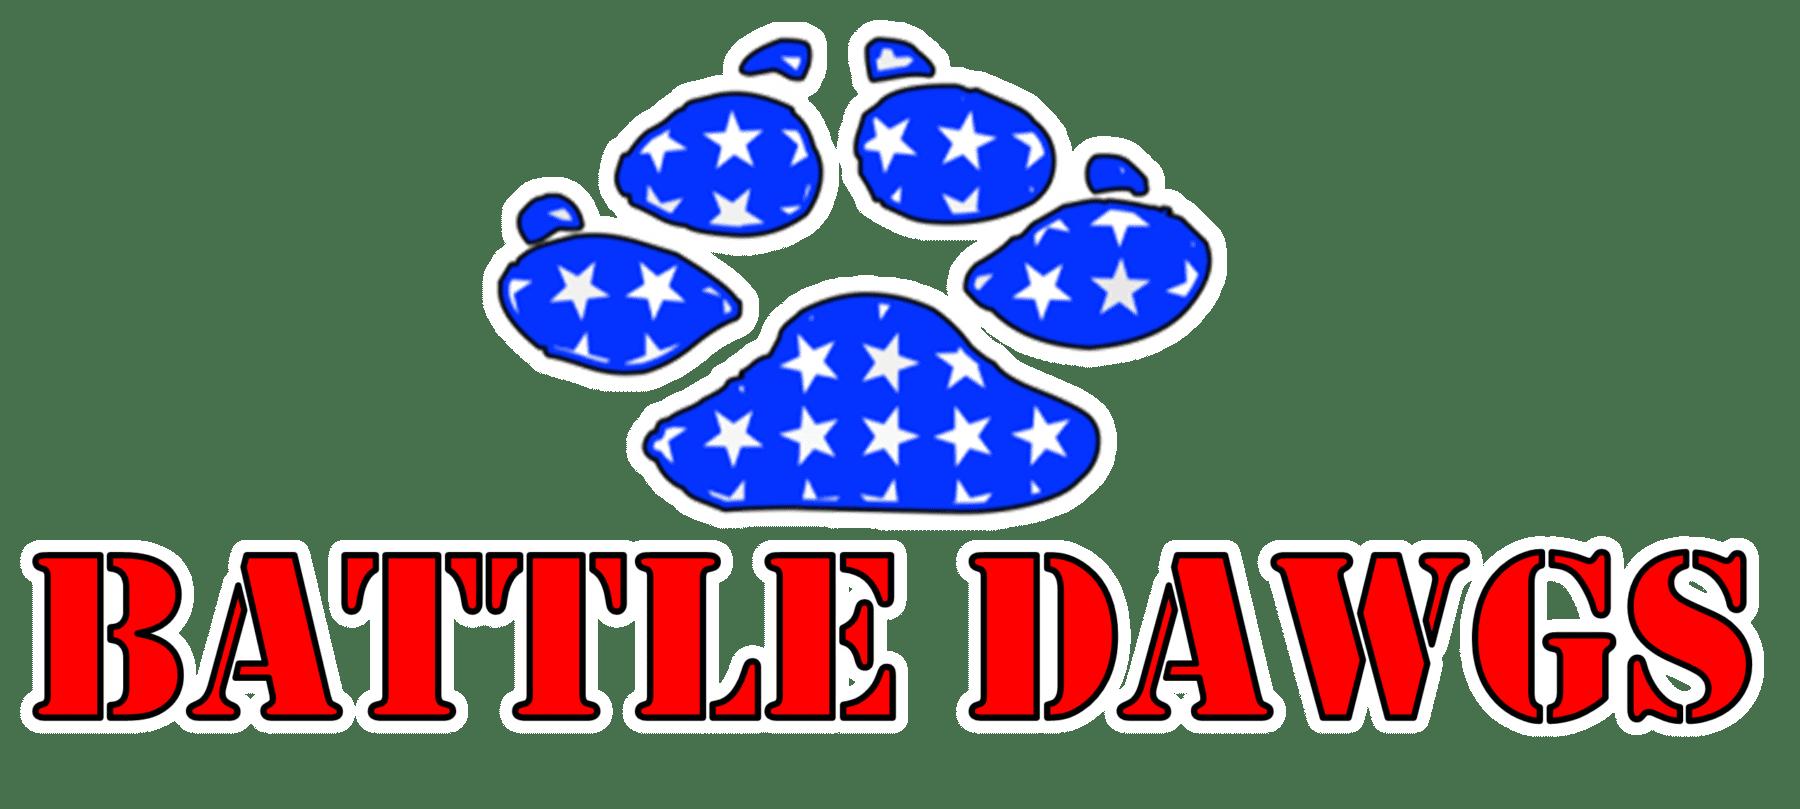 Image Battle Dawgs